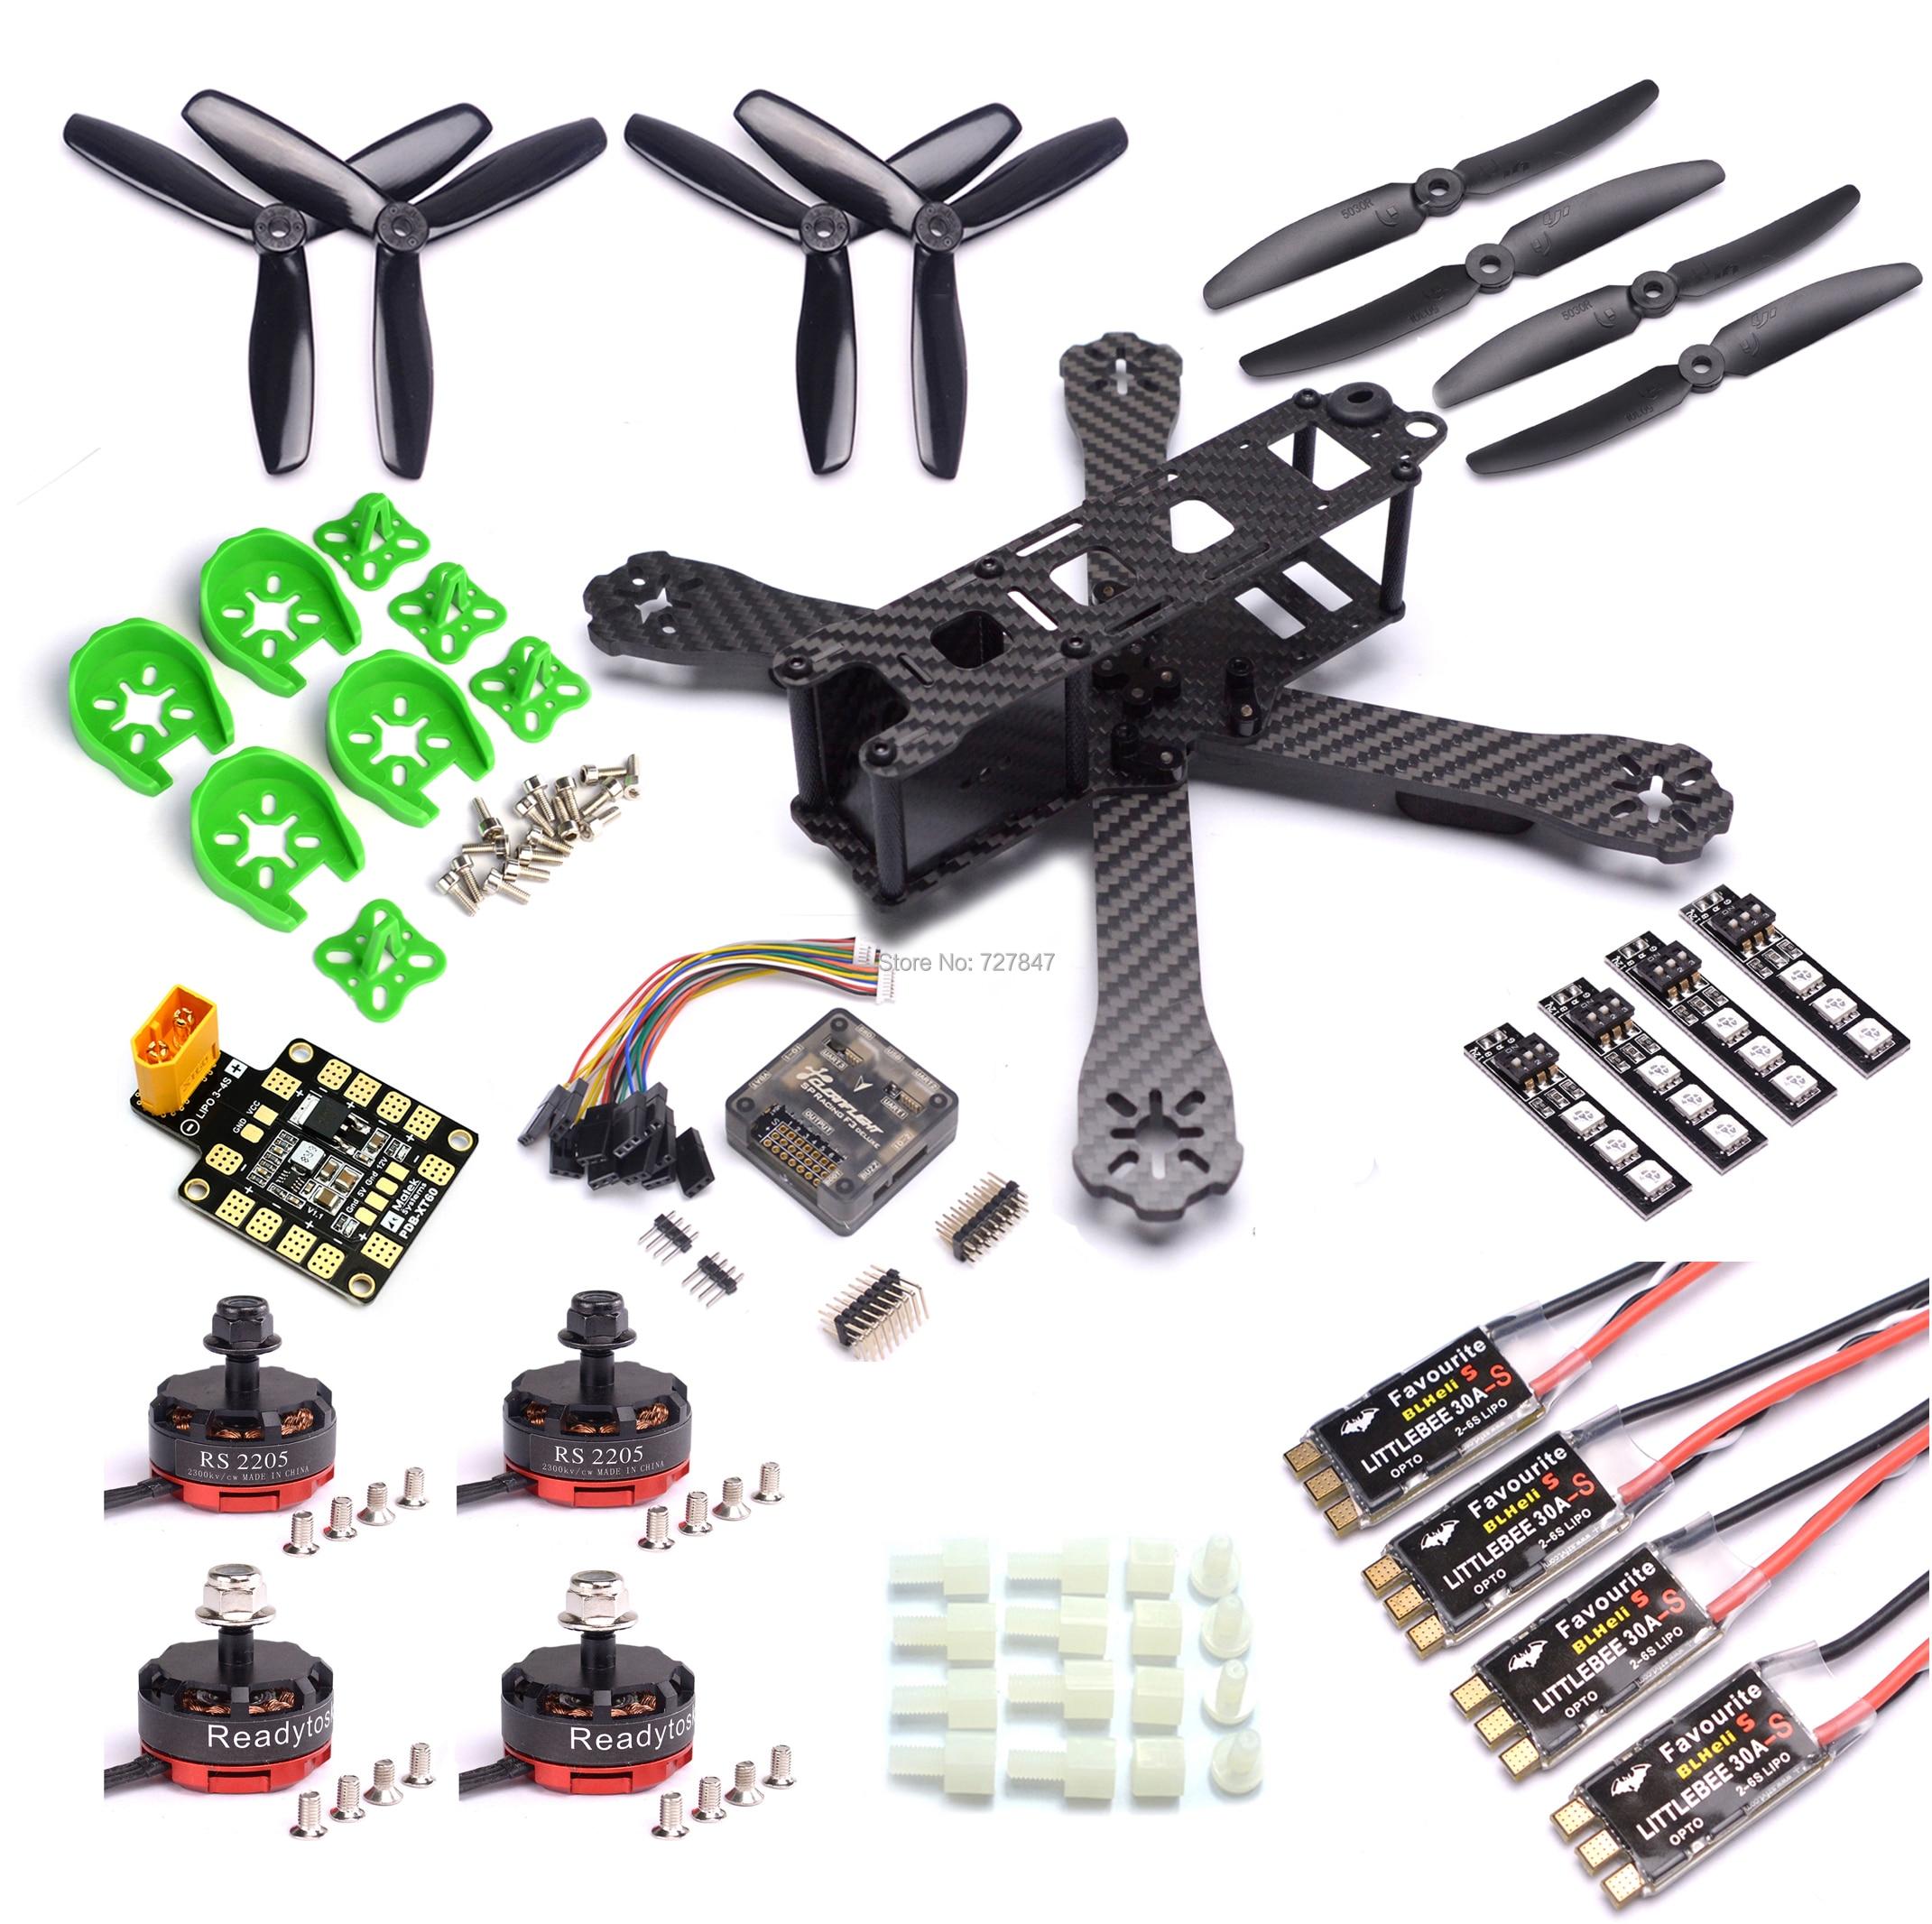 QAV-R 220mm Carbon Fiber Racing Drone Quadcopter QAV-R 220 F3 Flight Controller RS2205 2300KV Motor LittleBee 30A-S ESC BLHeli